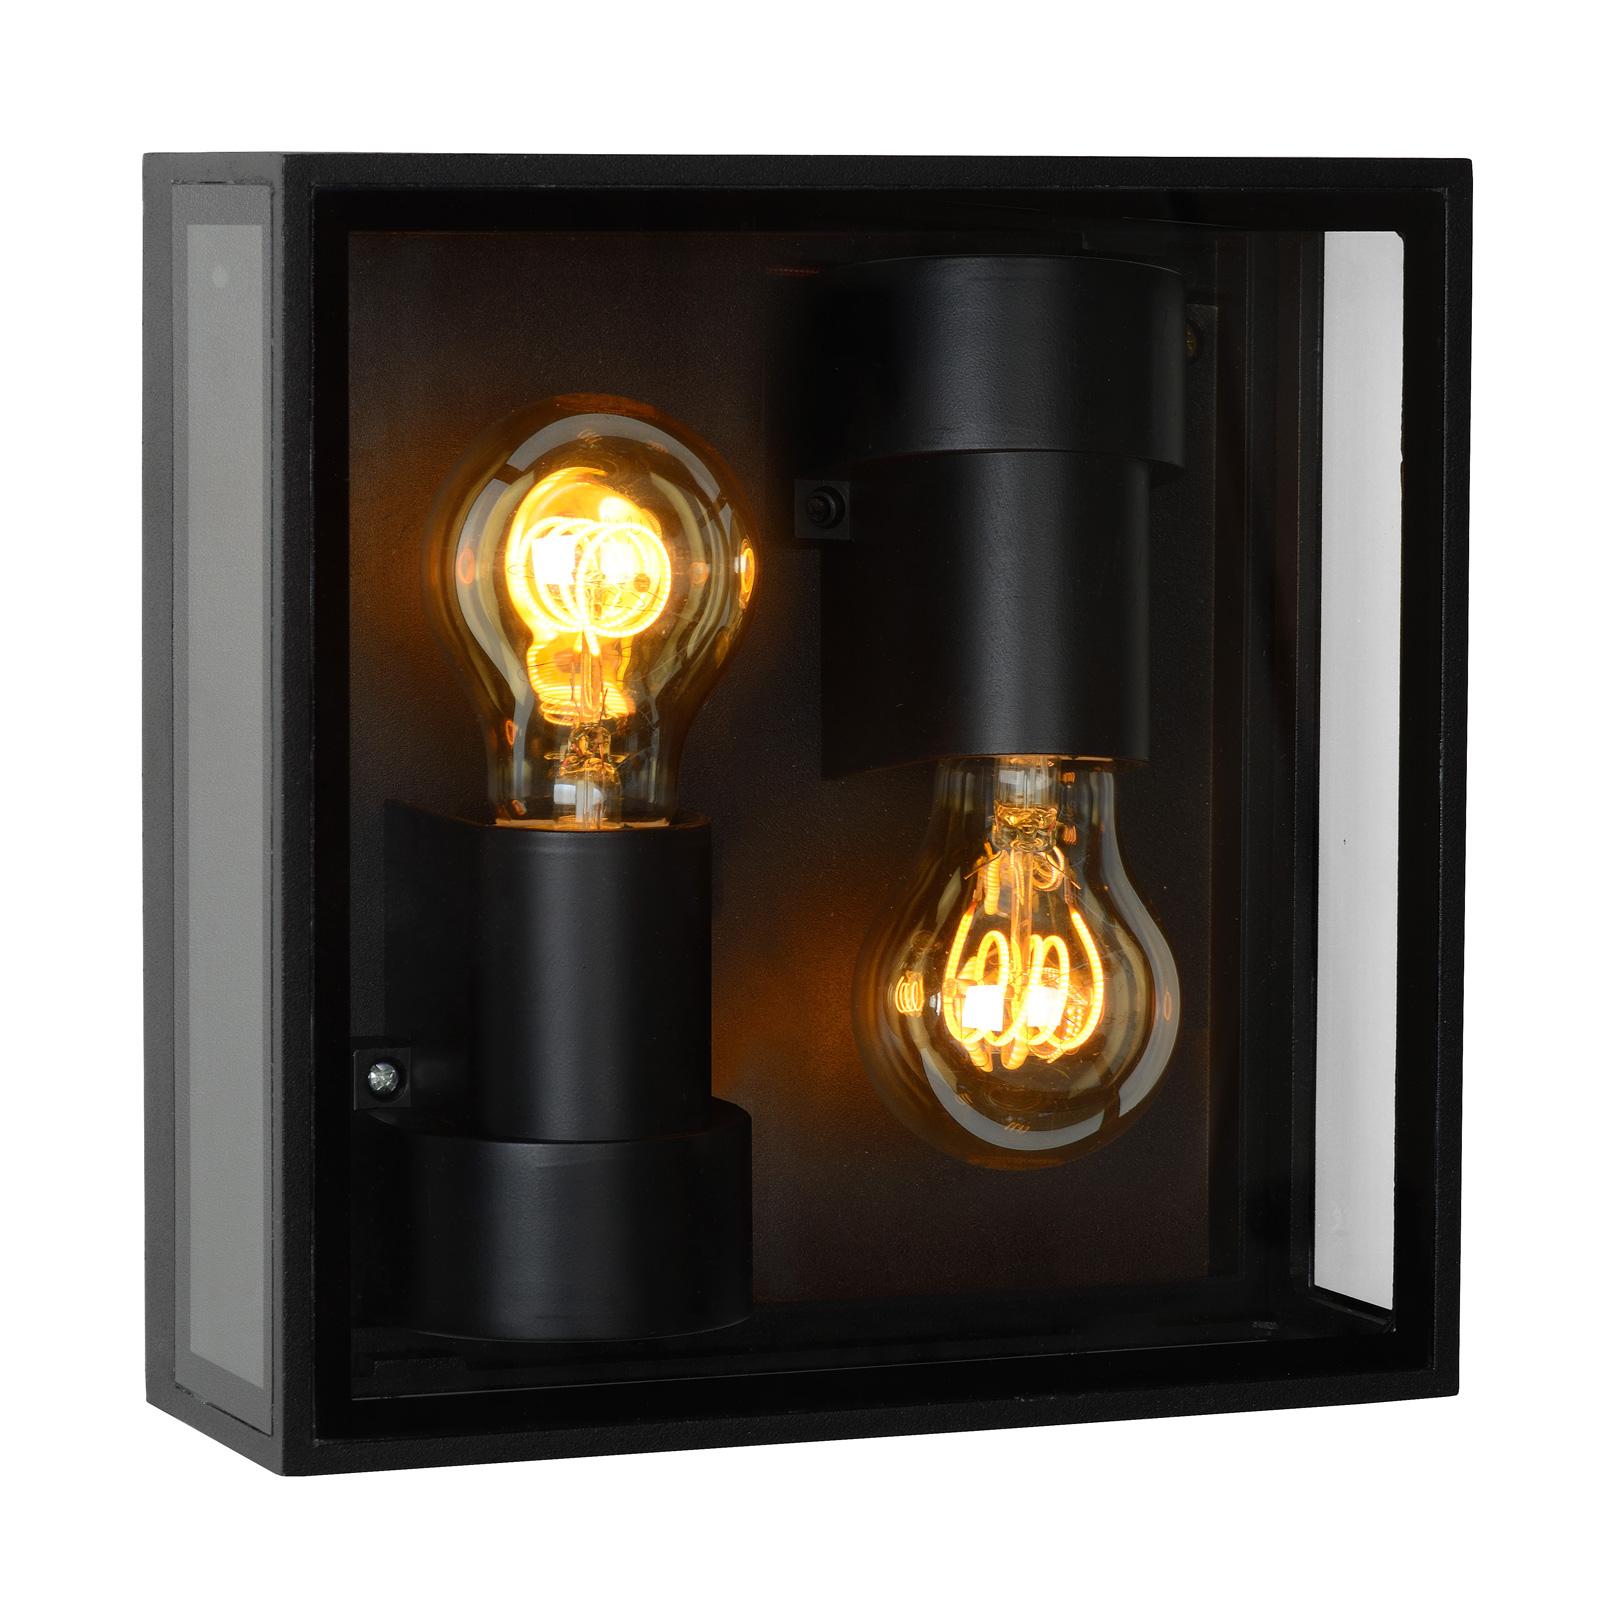 Lampa sufitowa zewnętrzna Dukan IP65, 2-punktowa